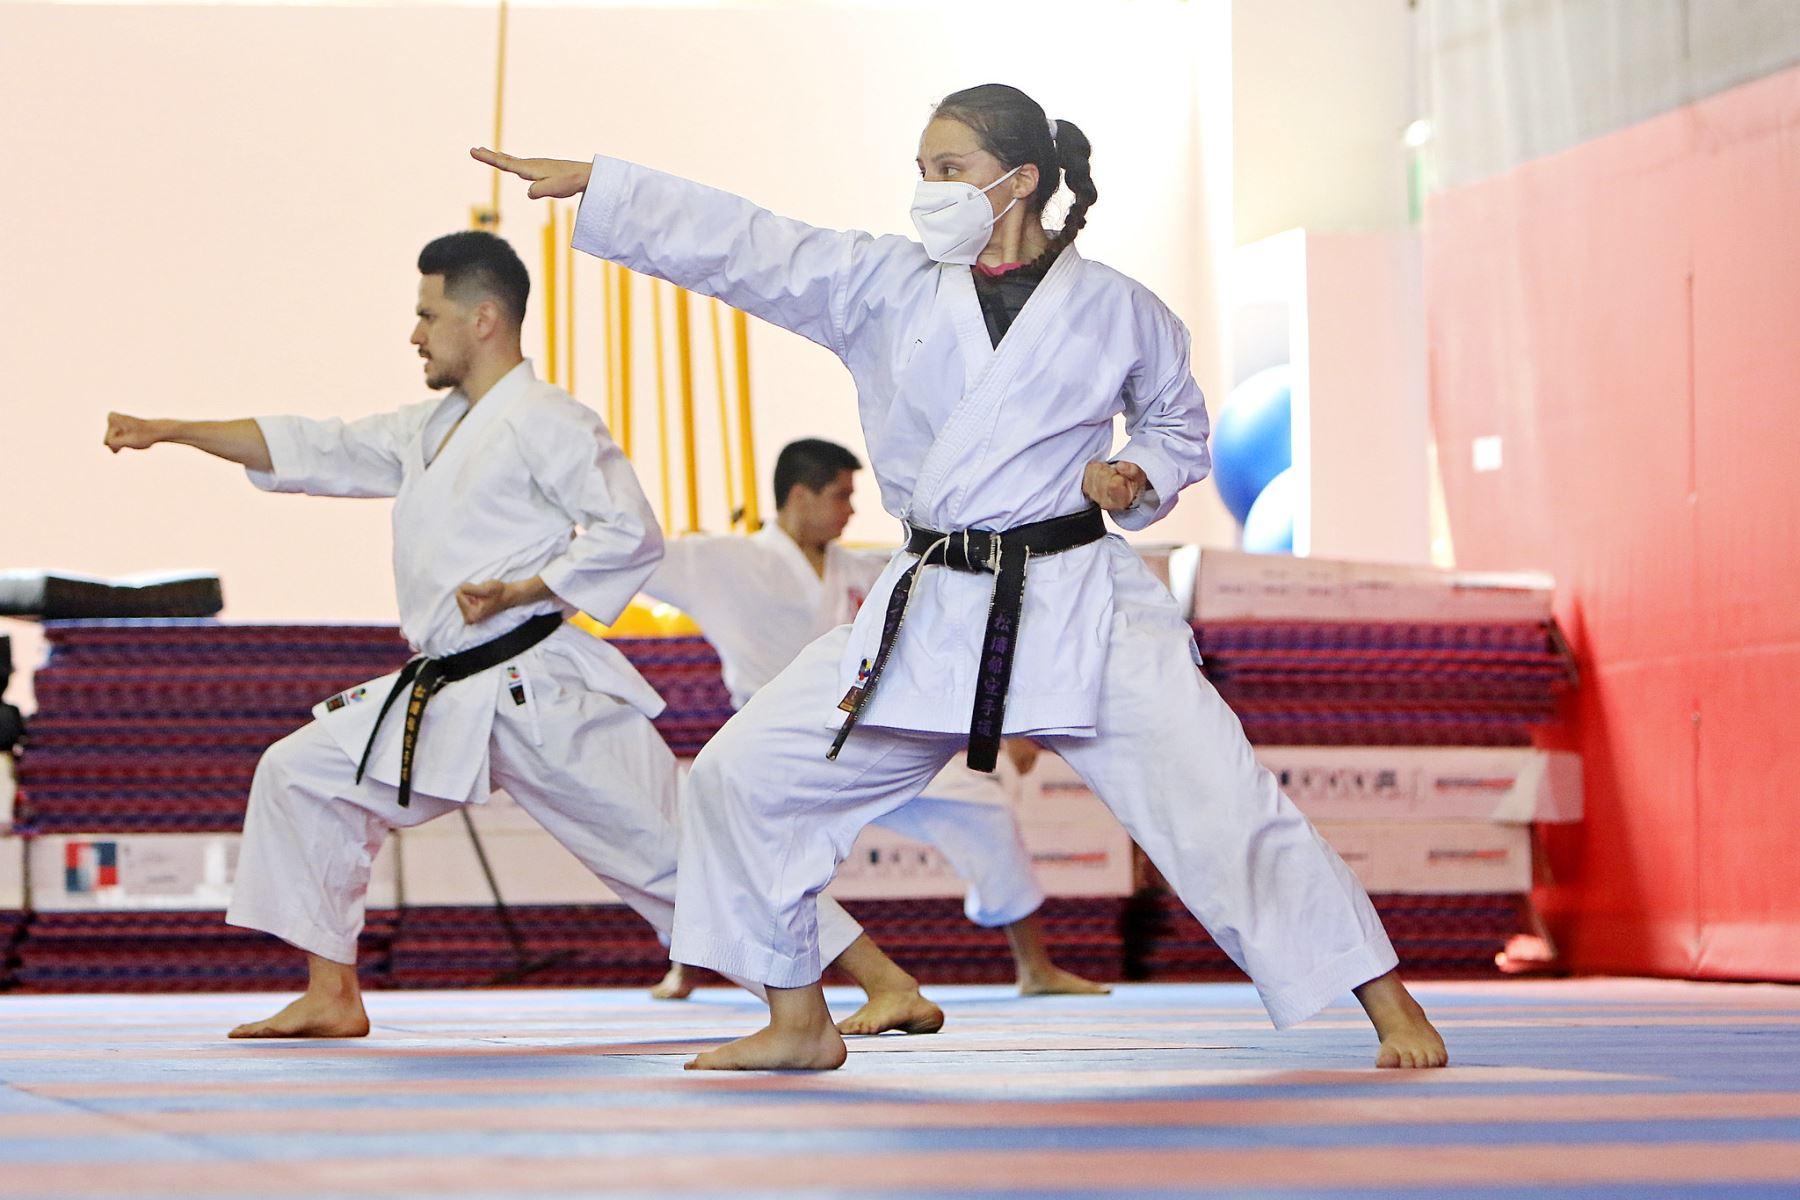 Medallistas en karate se preparan en Videna para clasificar a Tokios 2020